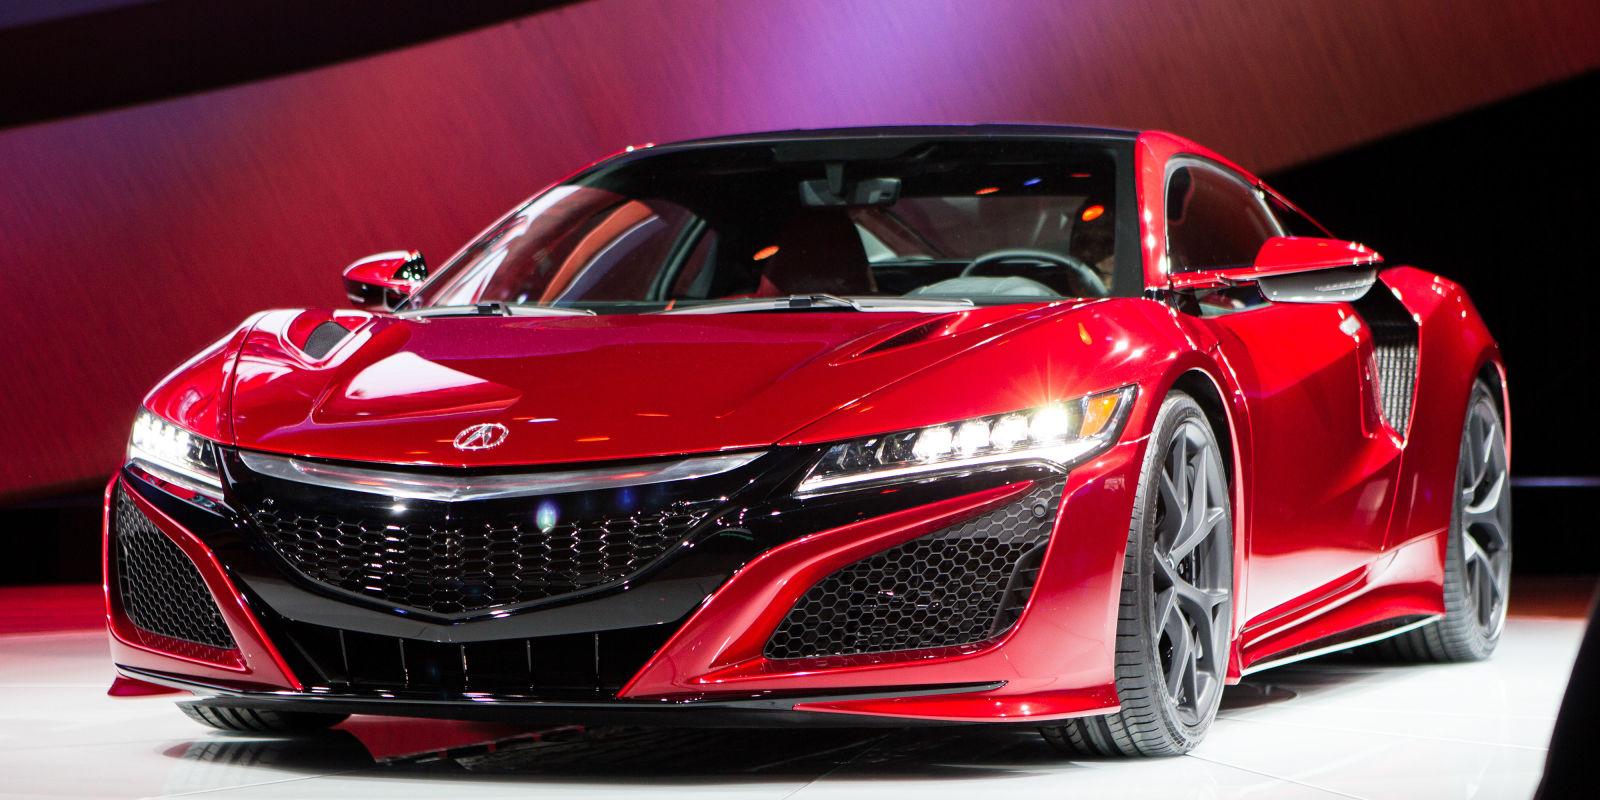 2016 Acura NSX Delayed